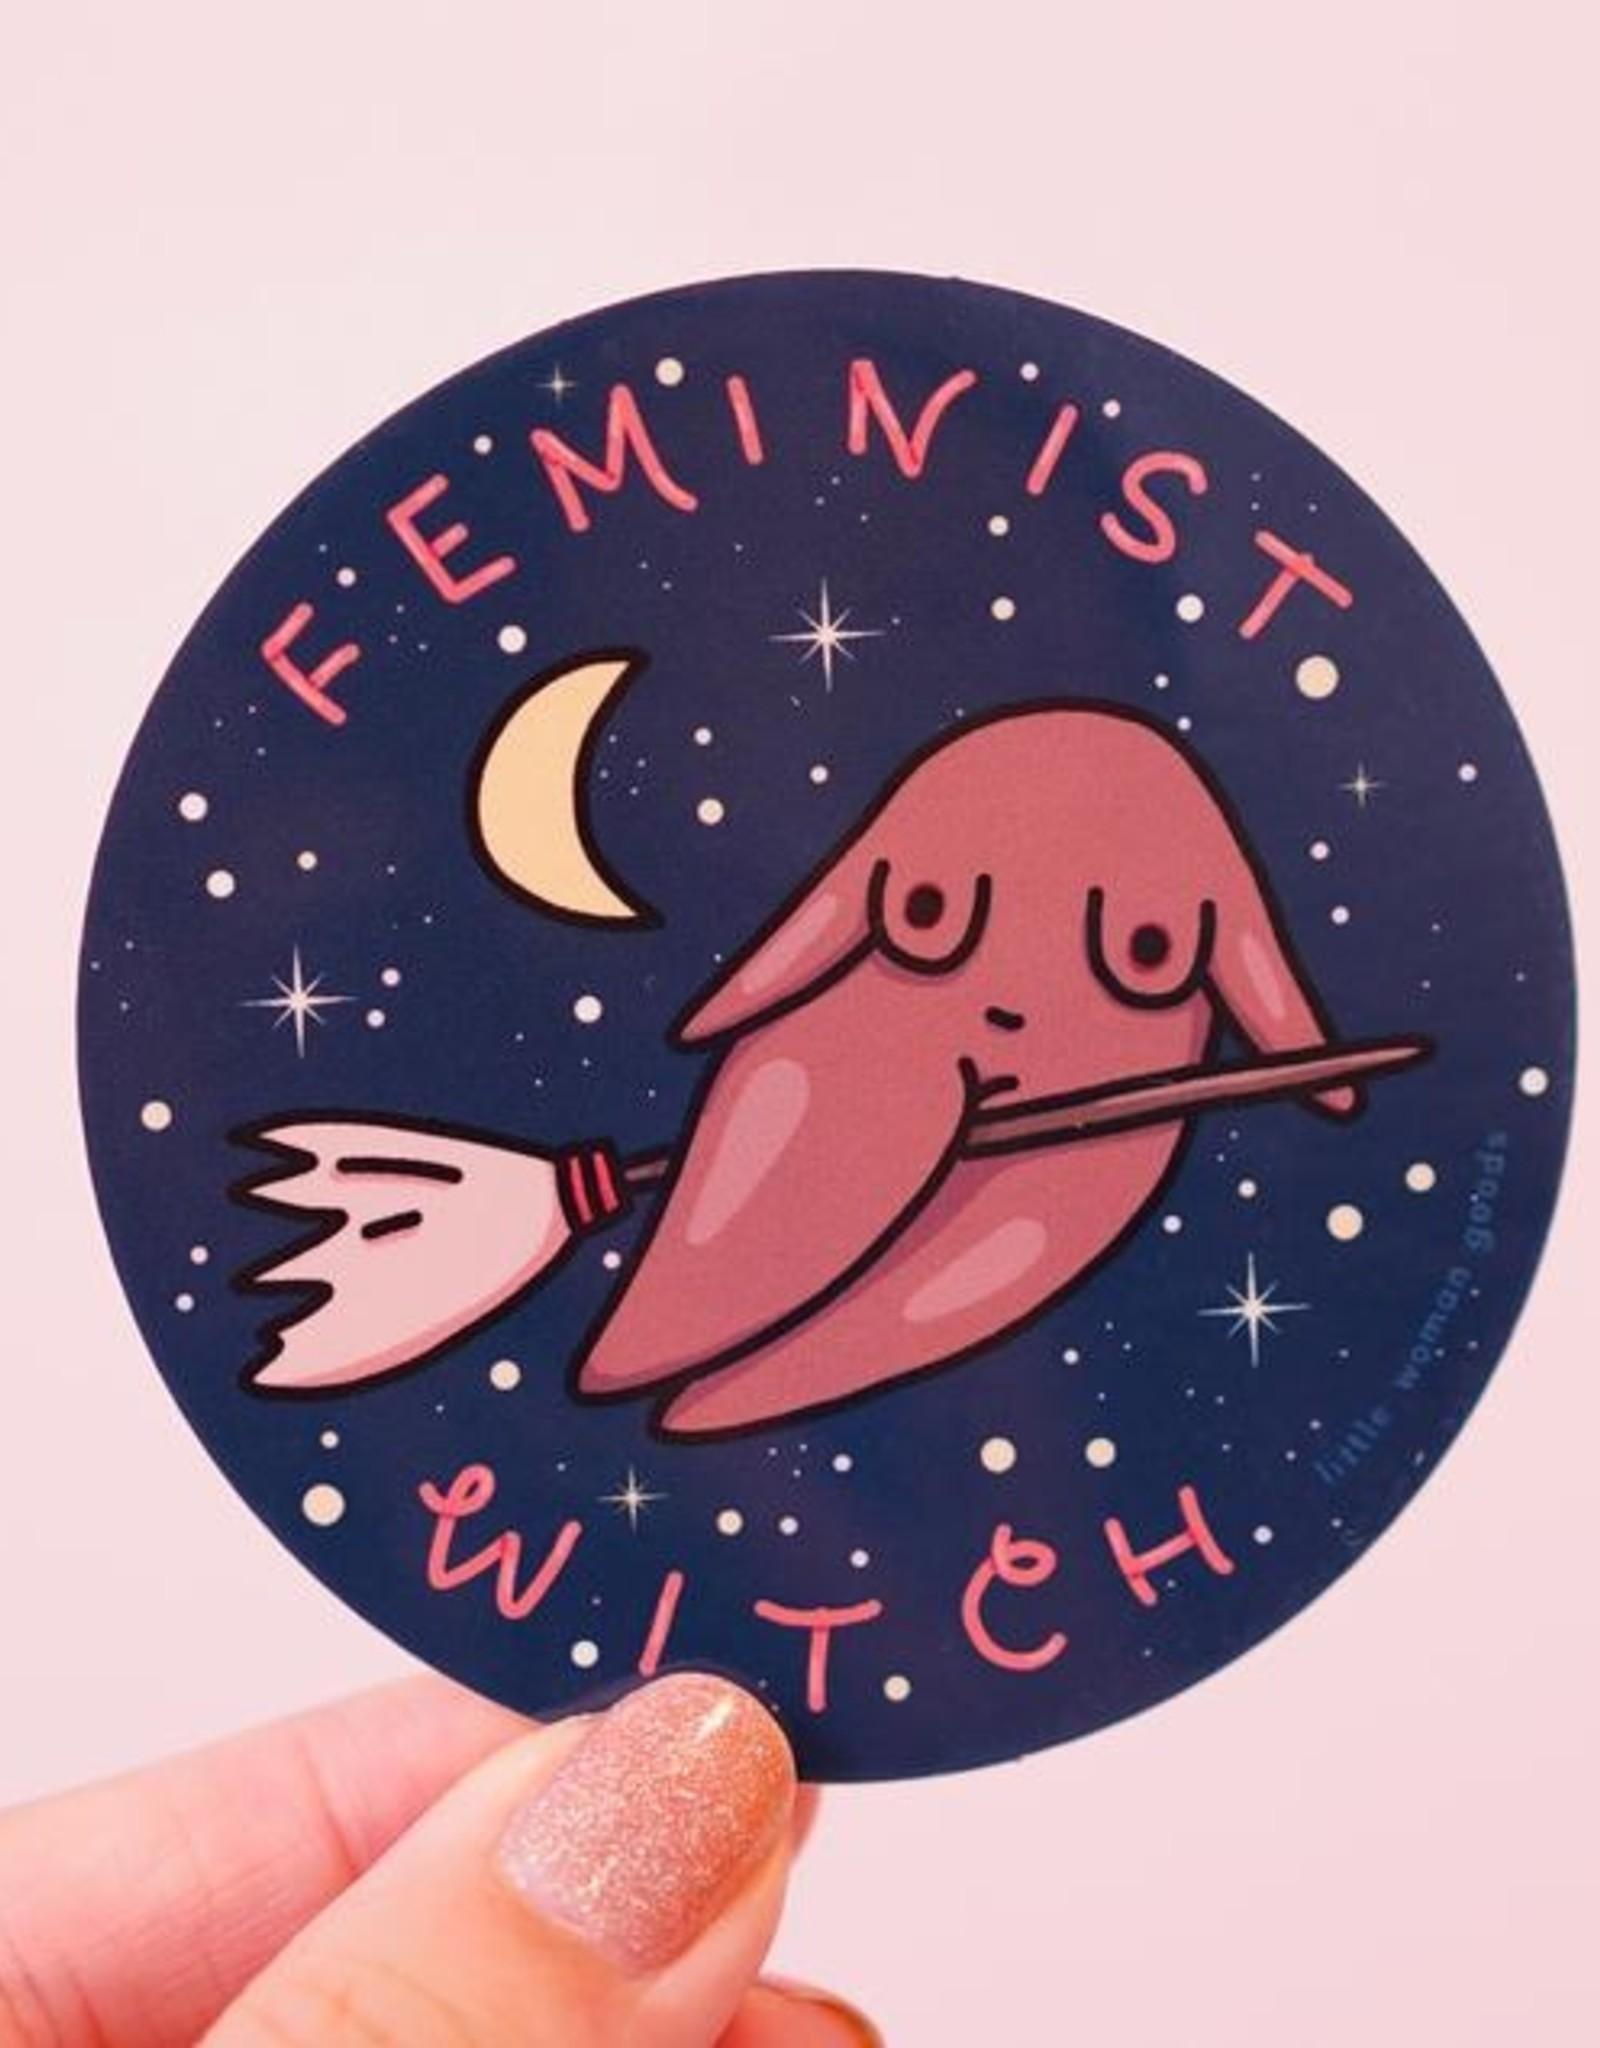 Little Woman Goods Witch Vinyl Sticker*